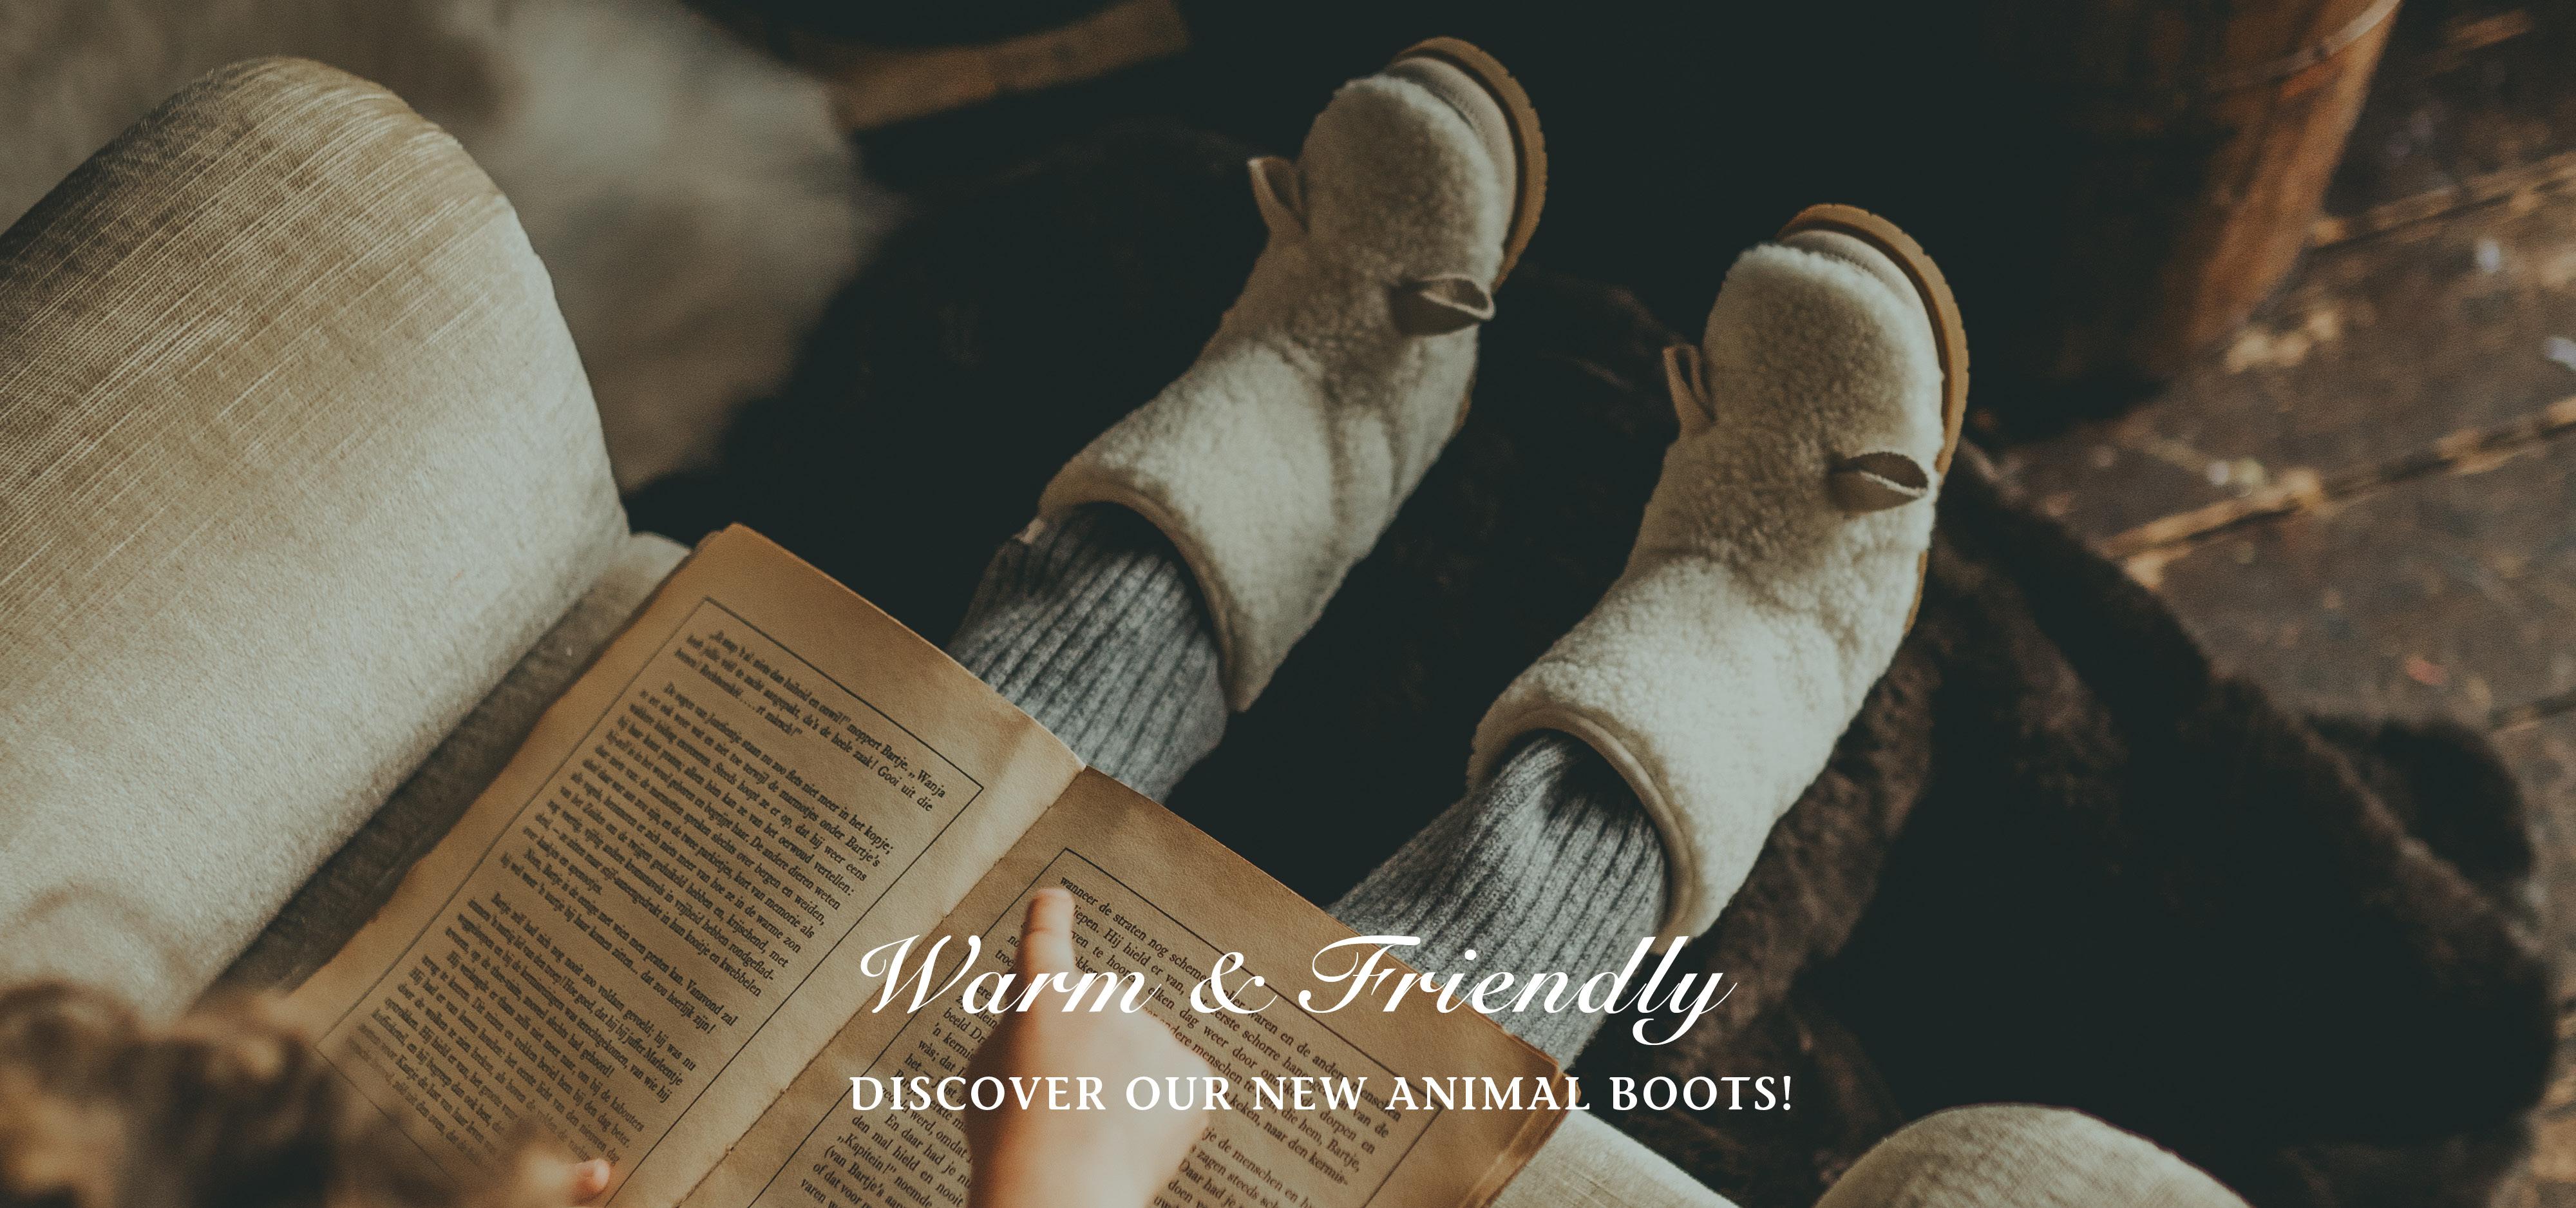 New Animal Boots